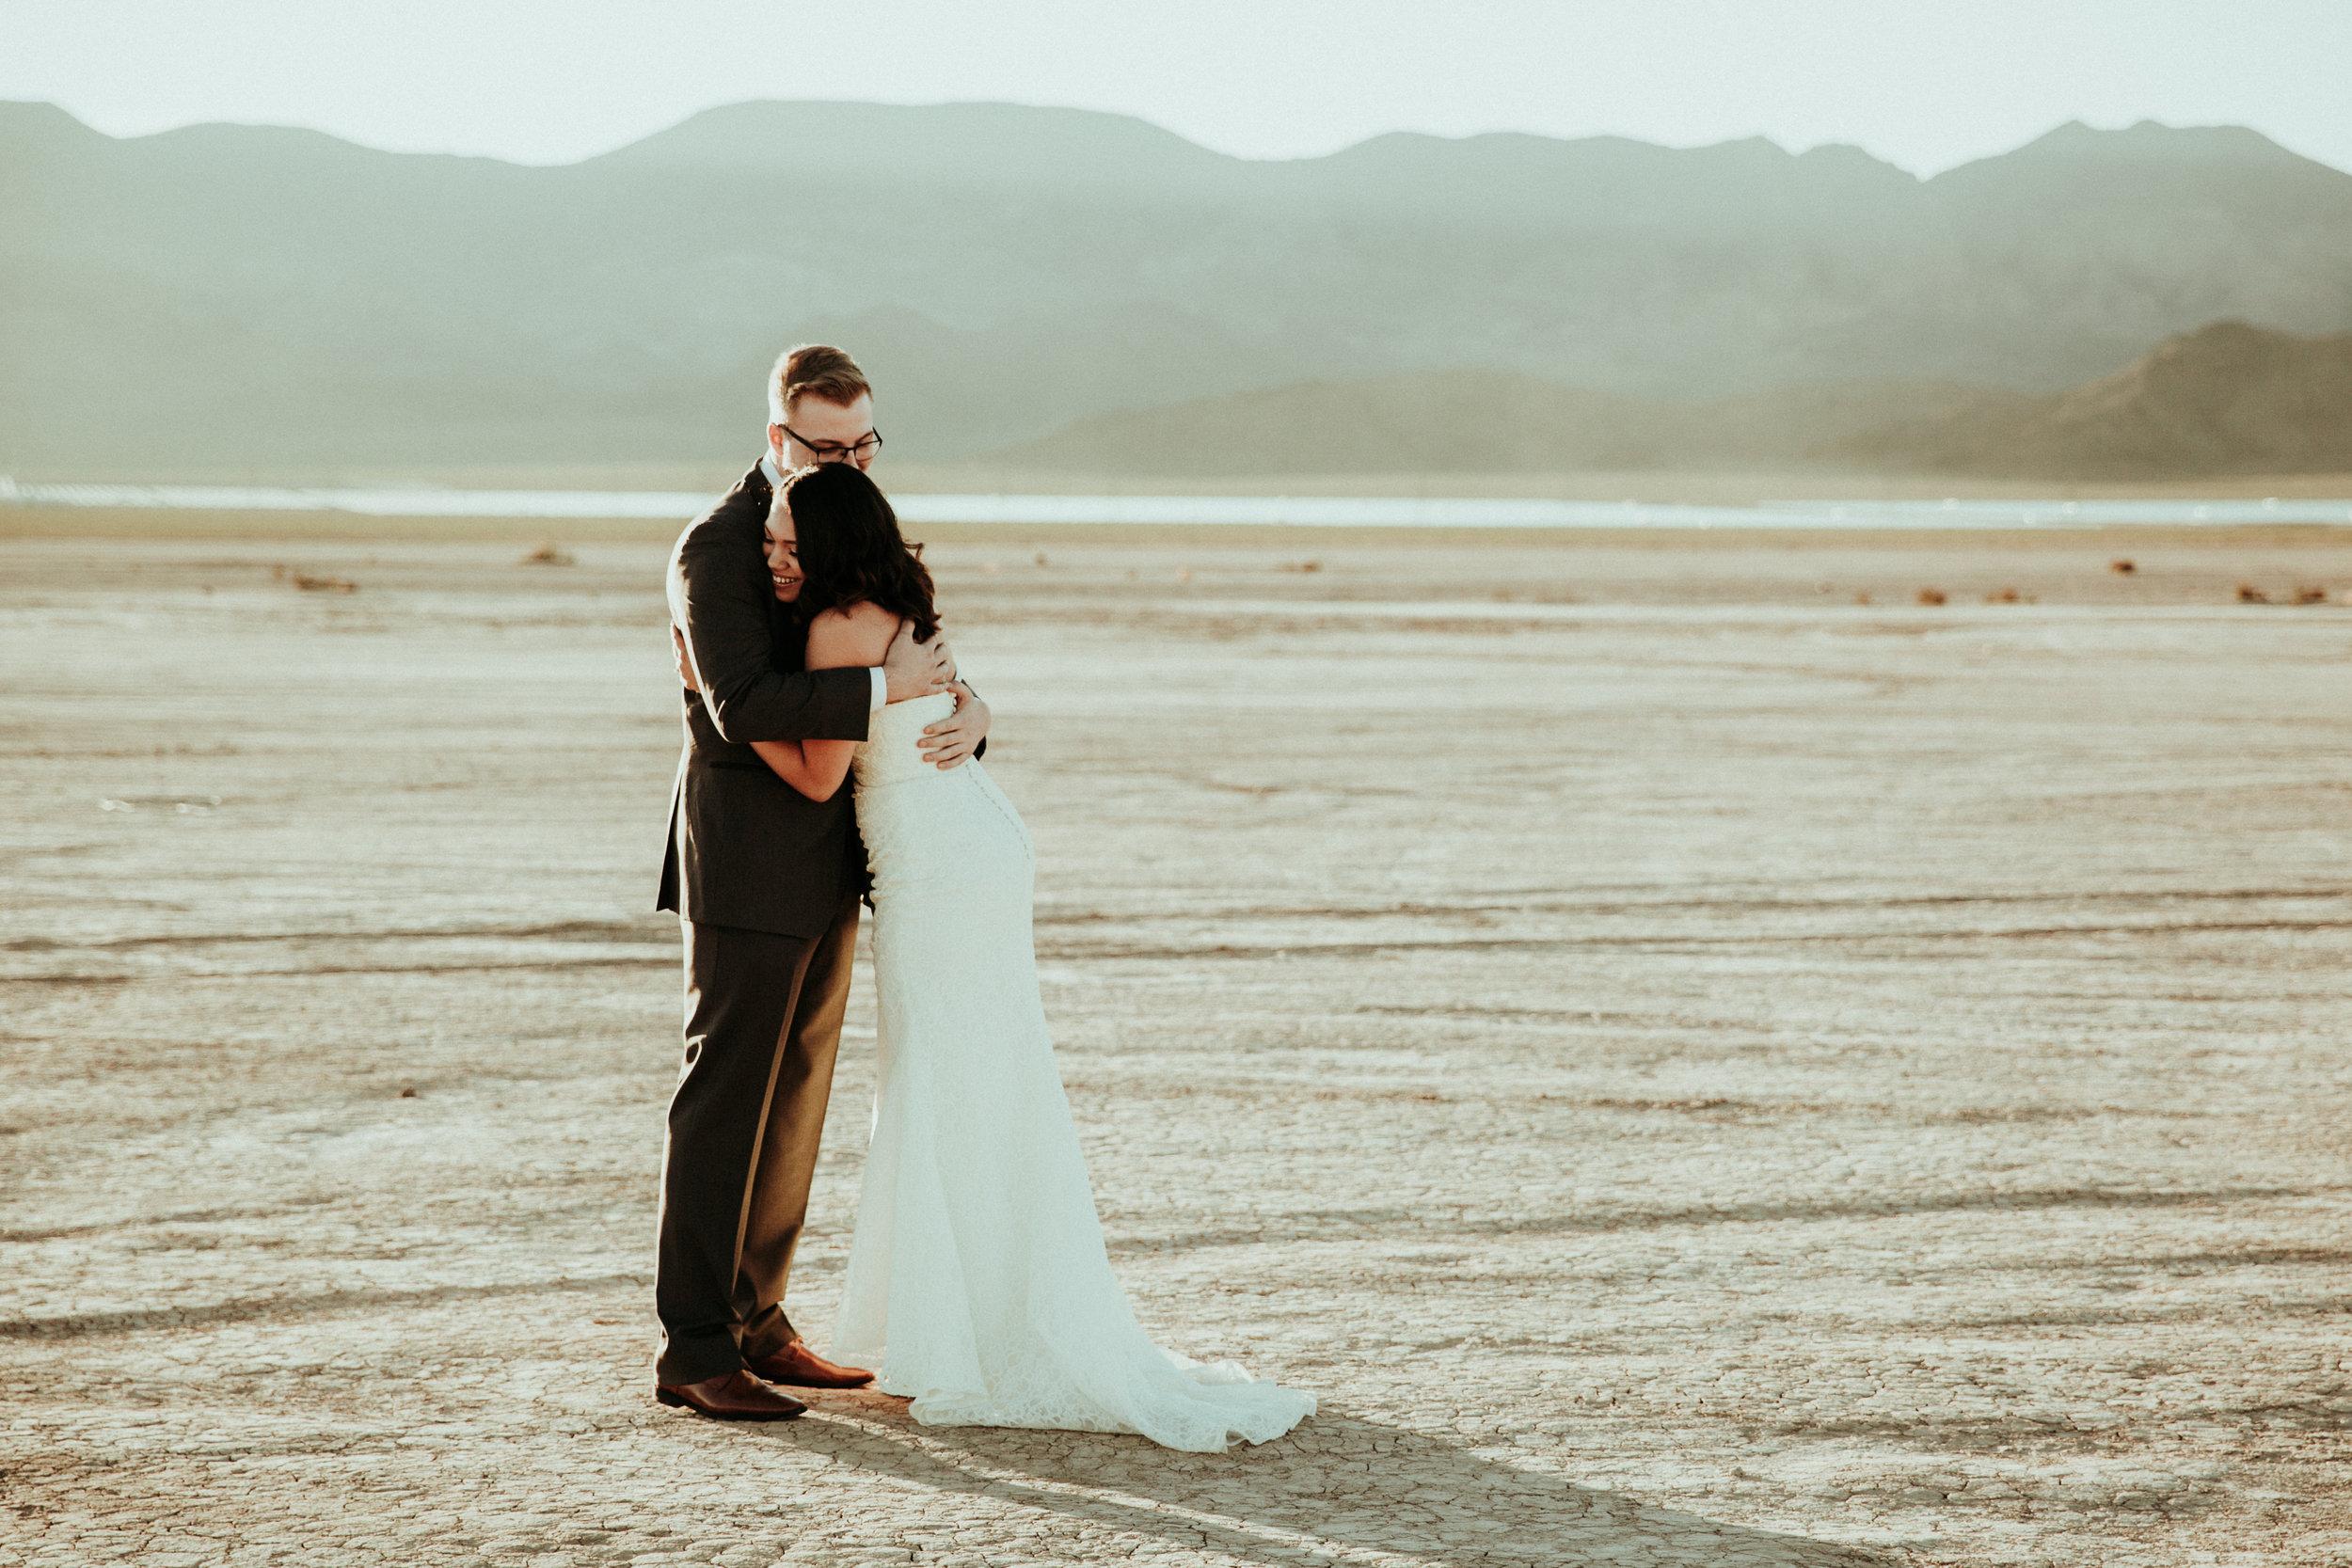 Las Vegas Wedding Photographer - Seattle Wedding Photographer - Washington Wedding - Nevada Wedding - Elopement Photographer - First Look